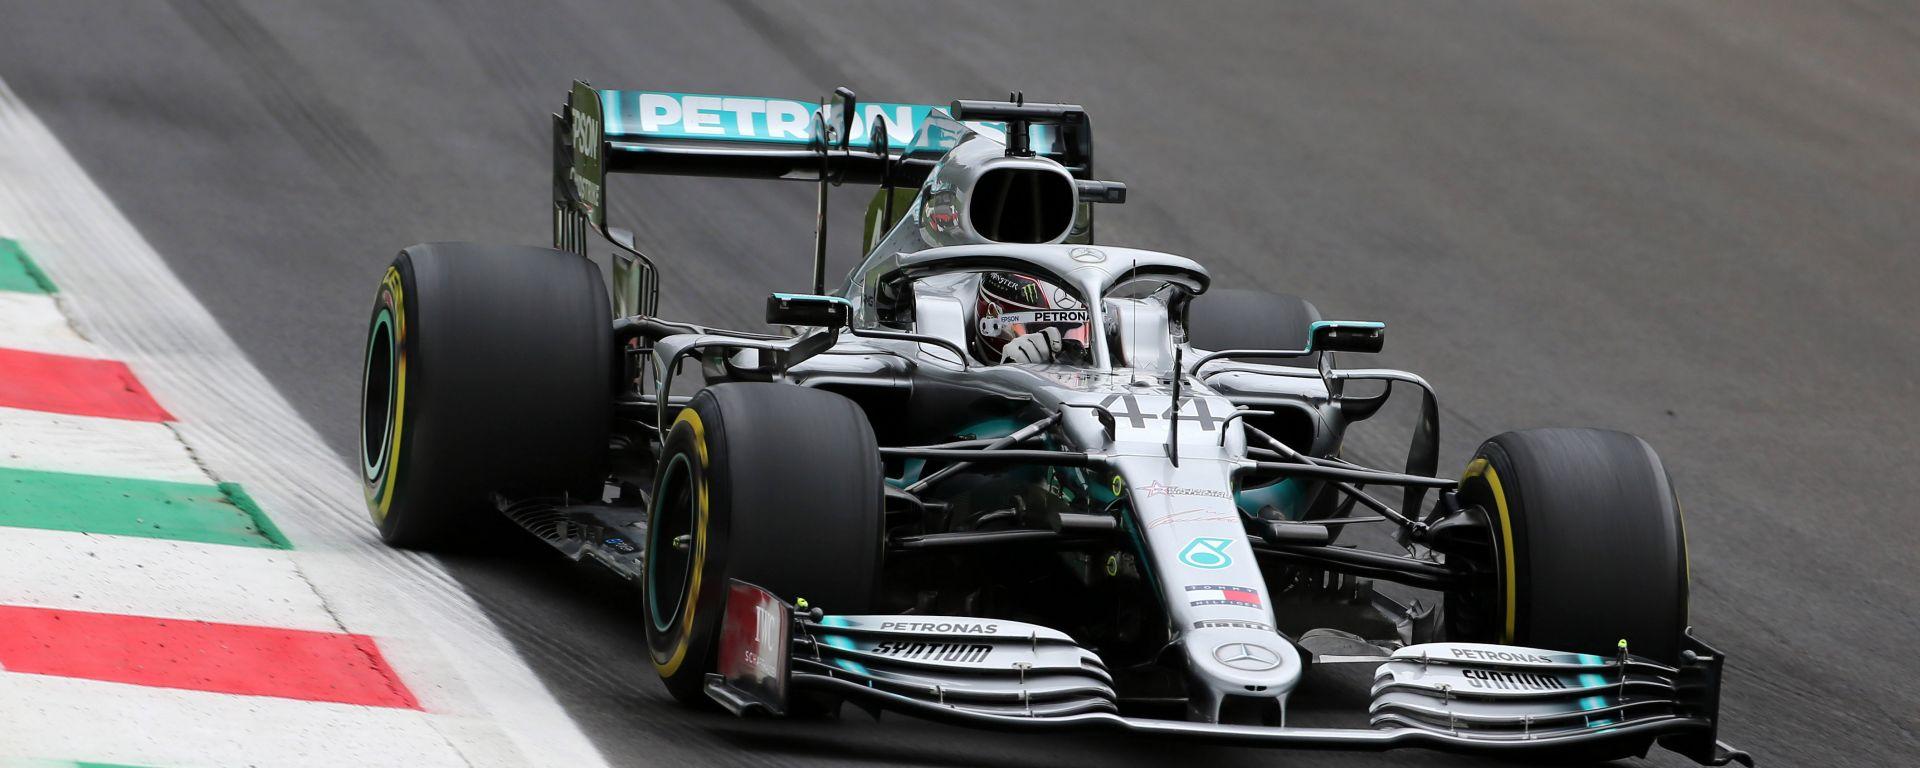 Lewis Hamilton (Mercedes) in pista a Monza